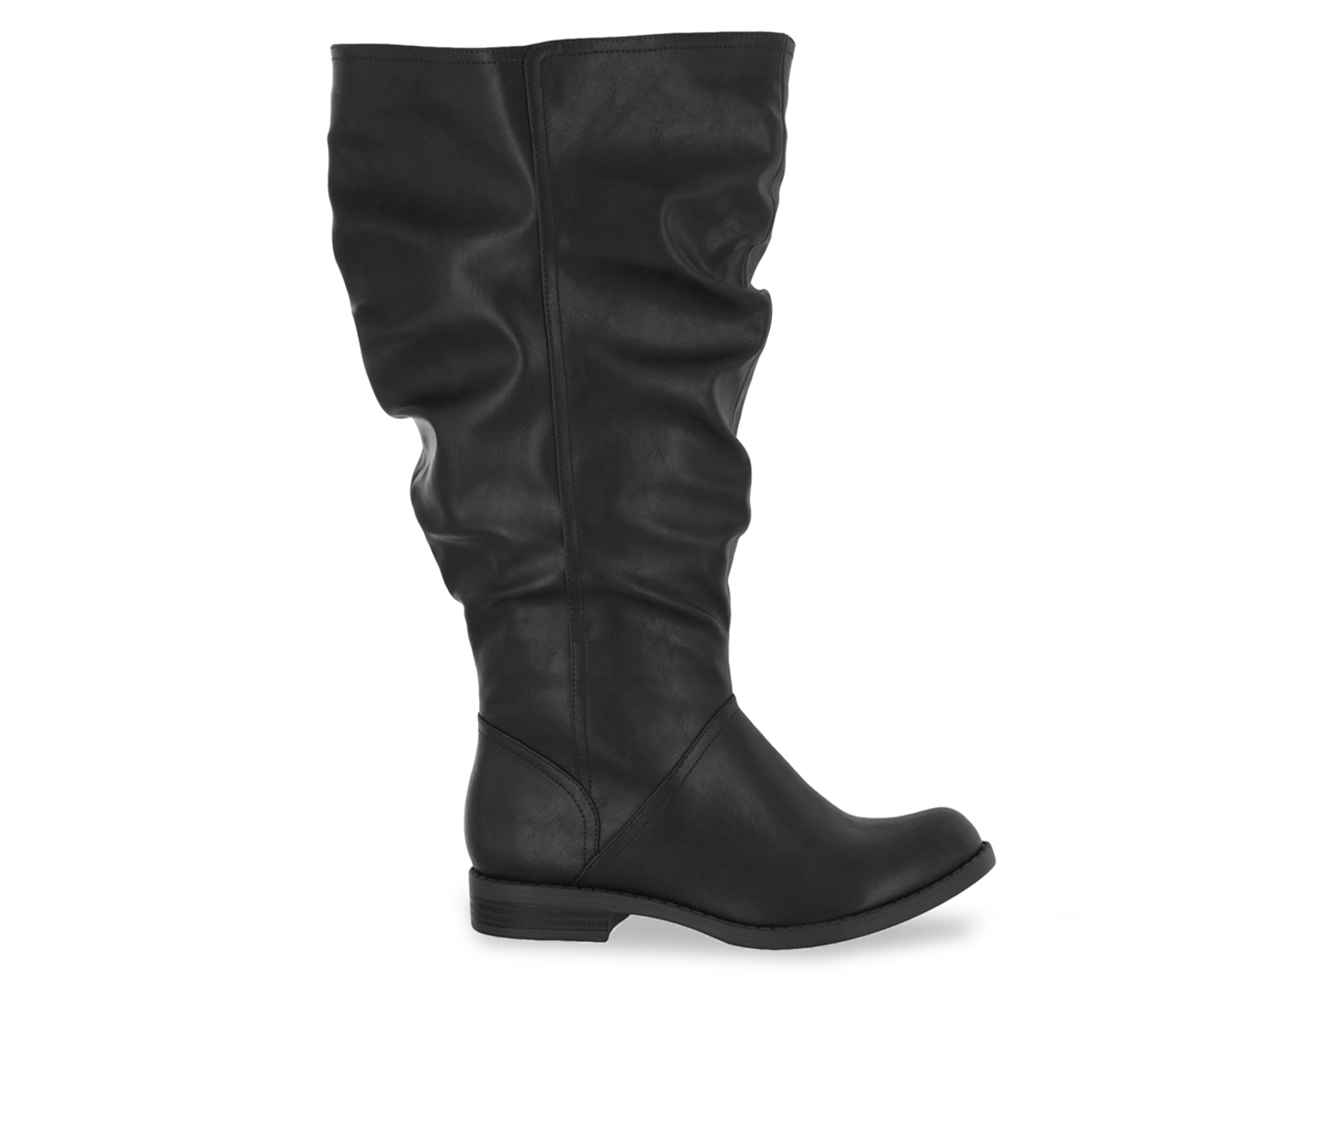 Easy Street Peak Plus Plus Women's Boots (Black - Faux Leather)